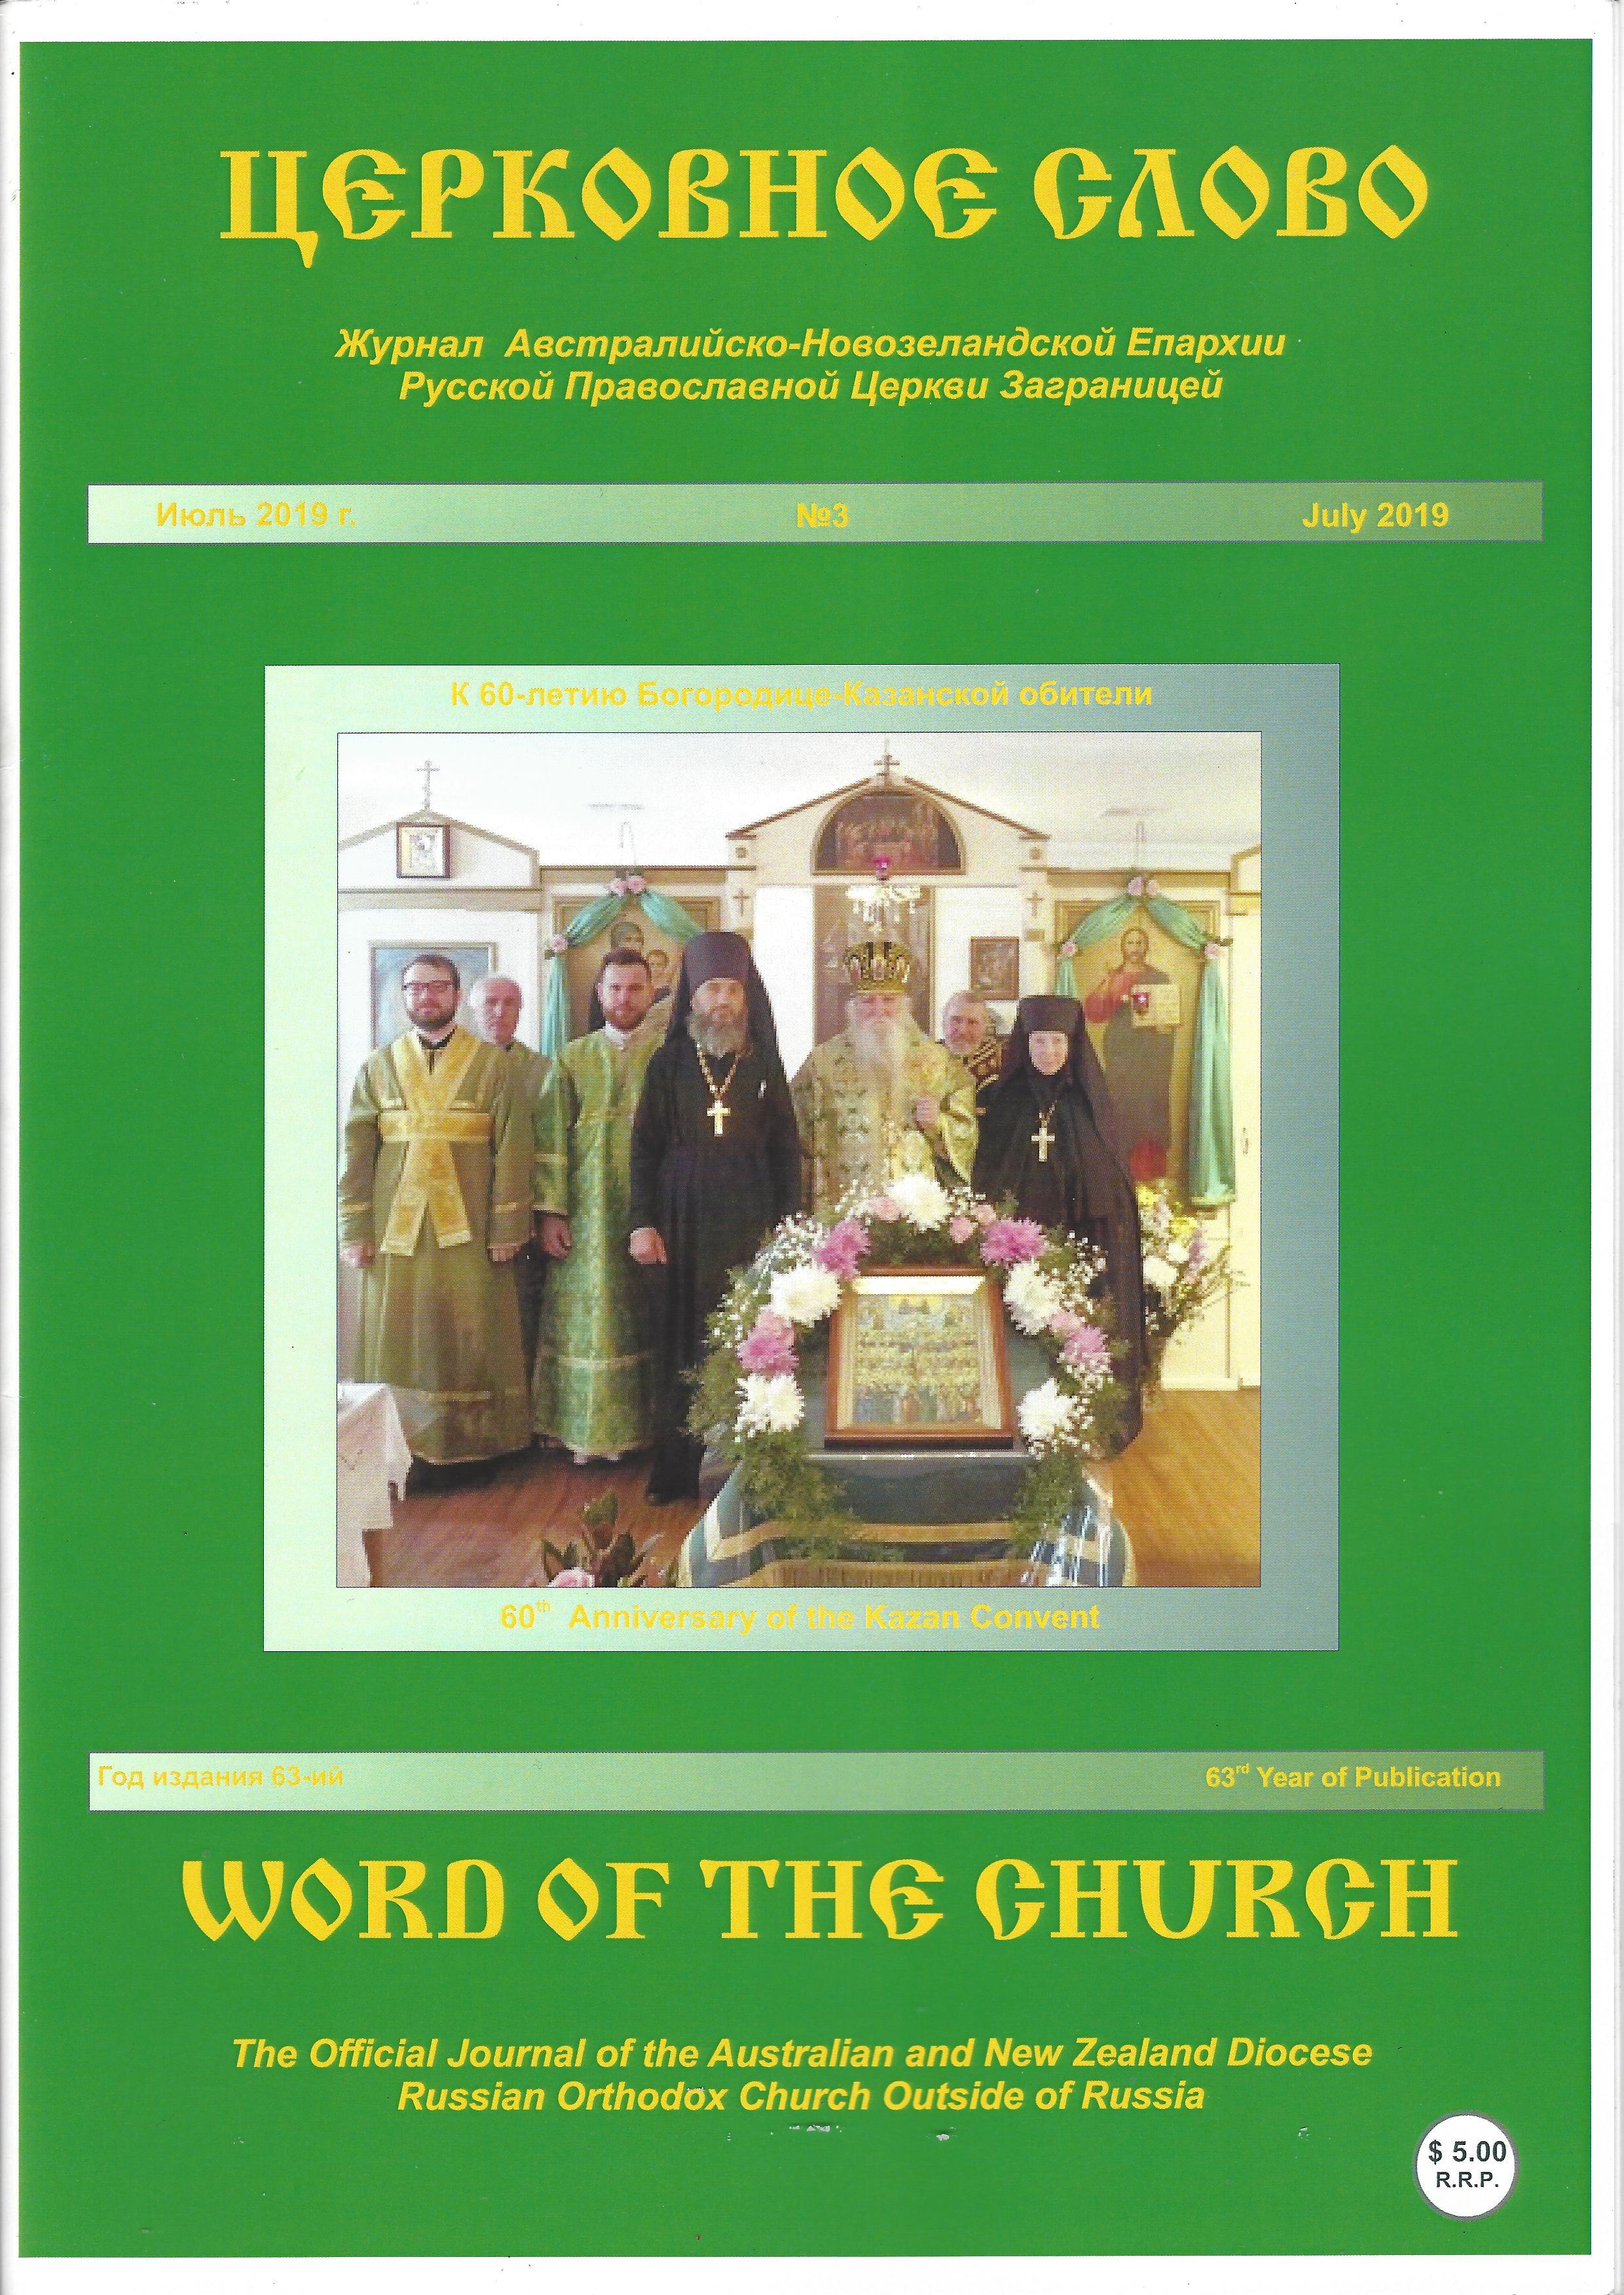 Saint Nicholas Russian Orthodox Church - Home